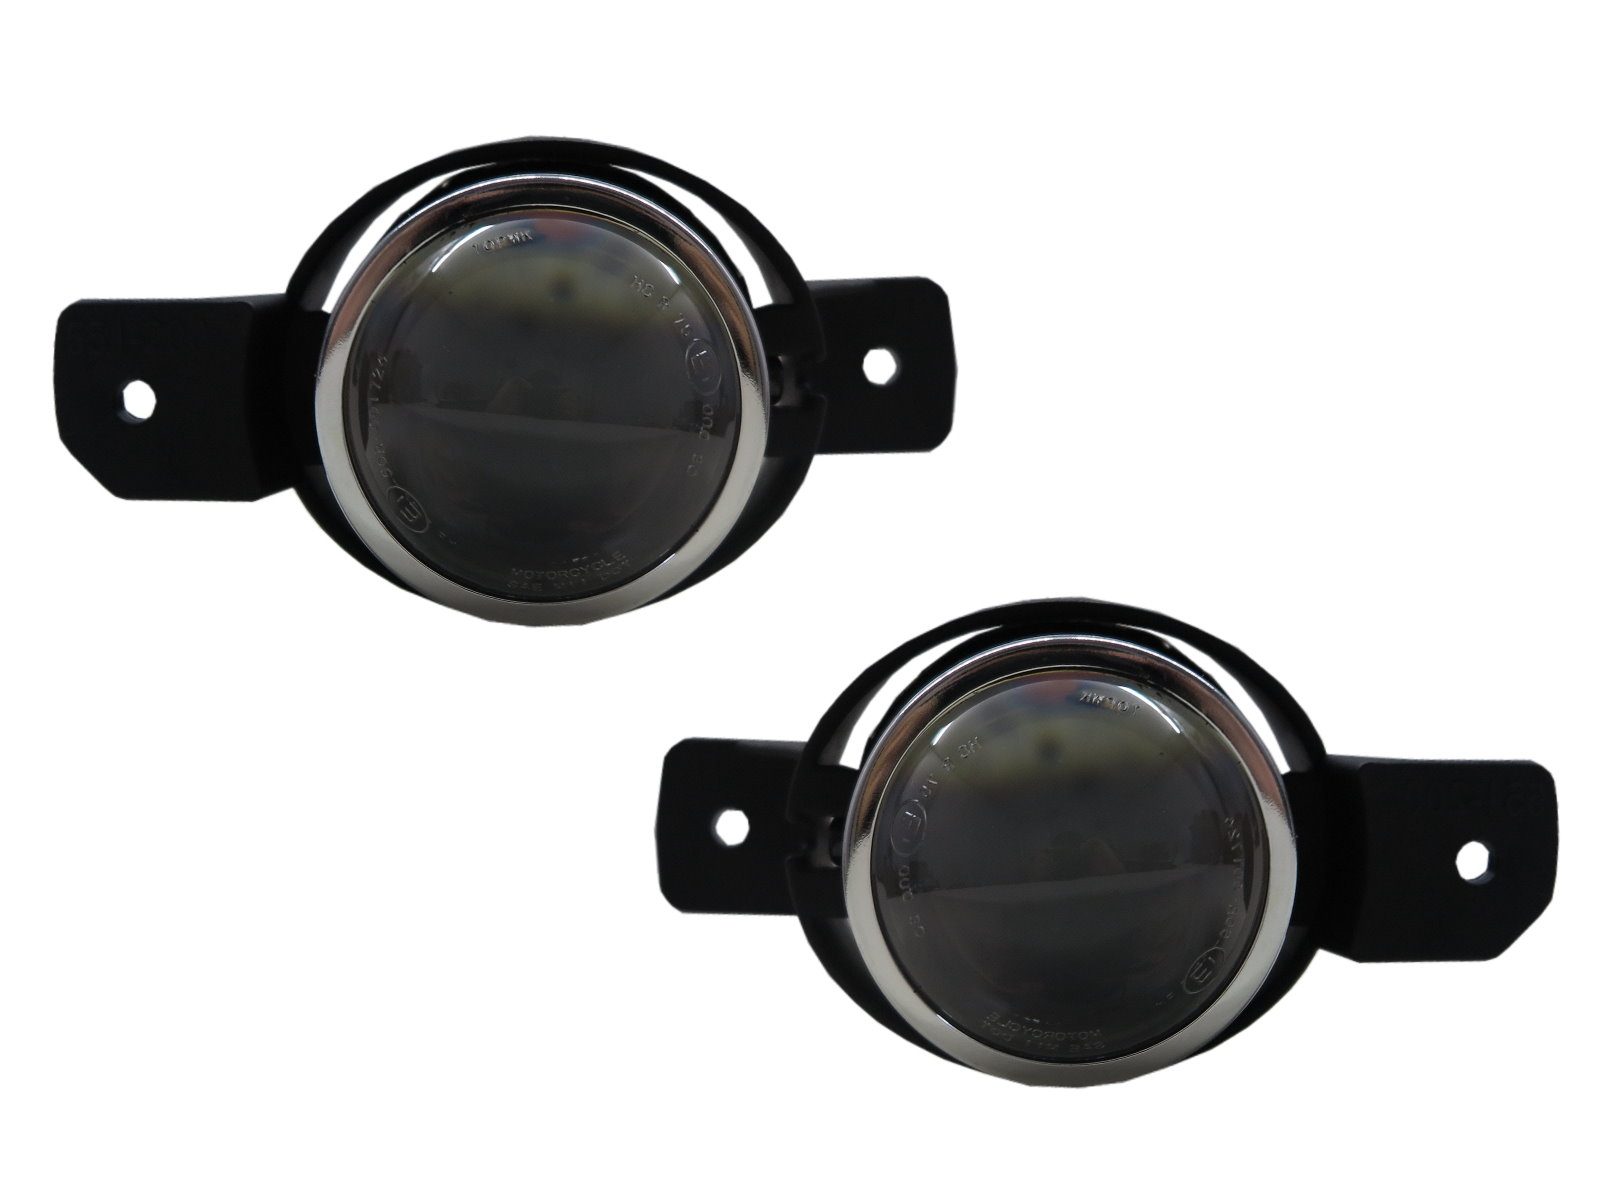 Sunny G10/N16 MK7 2012-2019 Sedan 4D Projector Fog Light Black for NISSAN